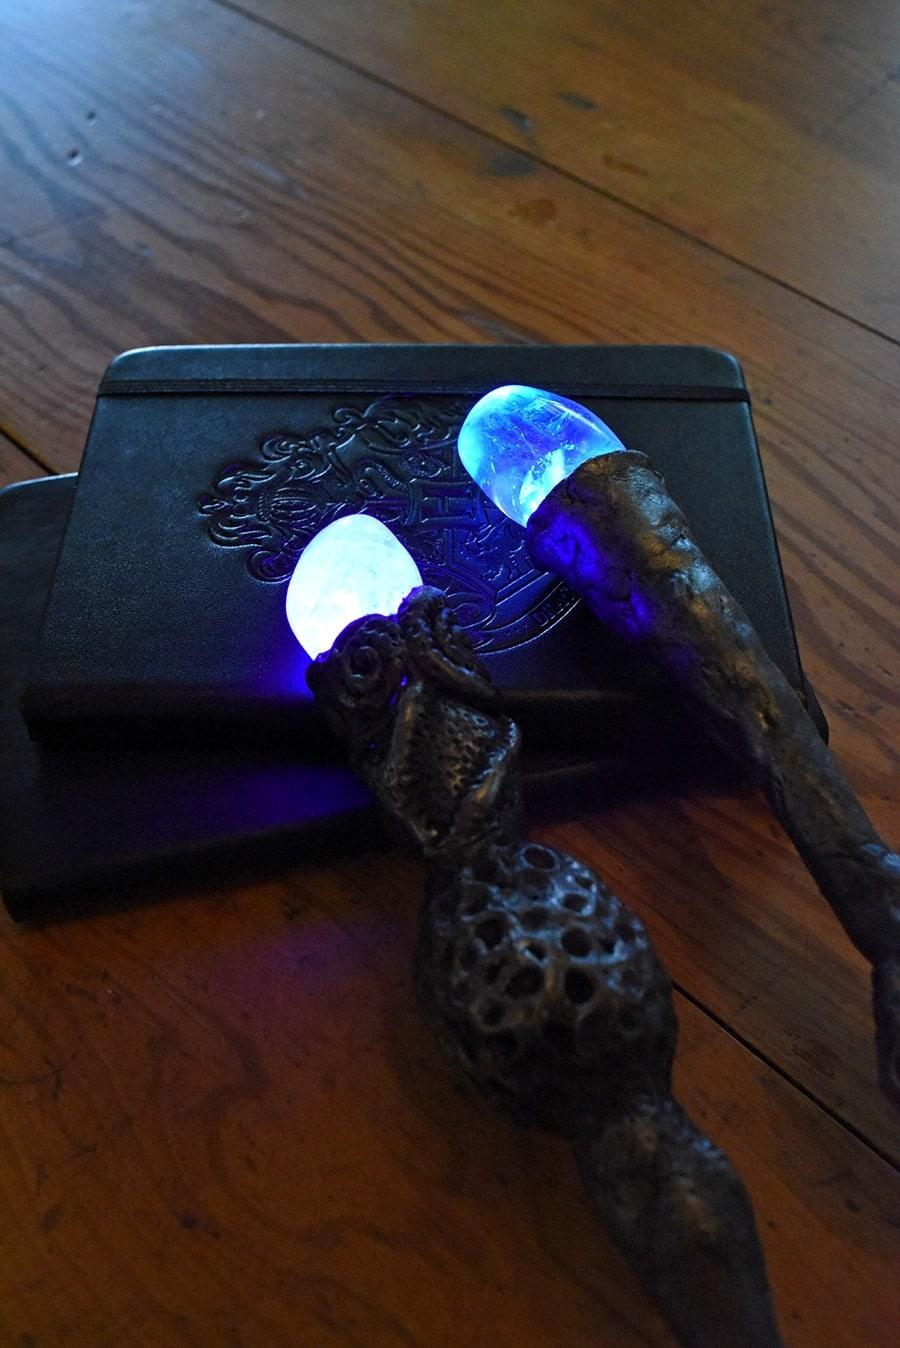 Wands glowing in the dark